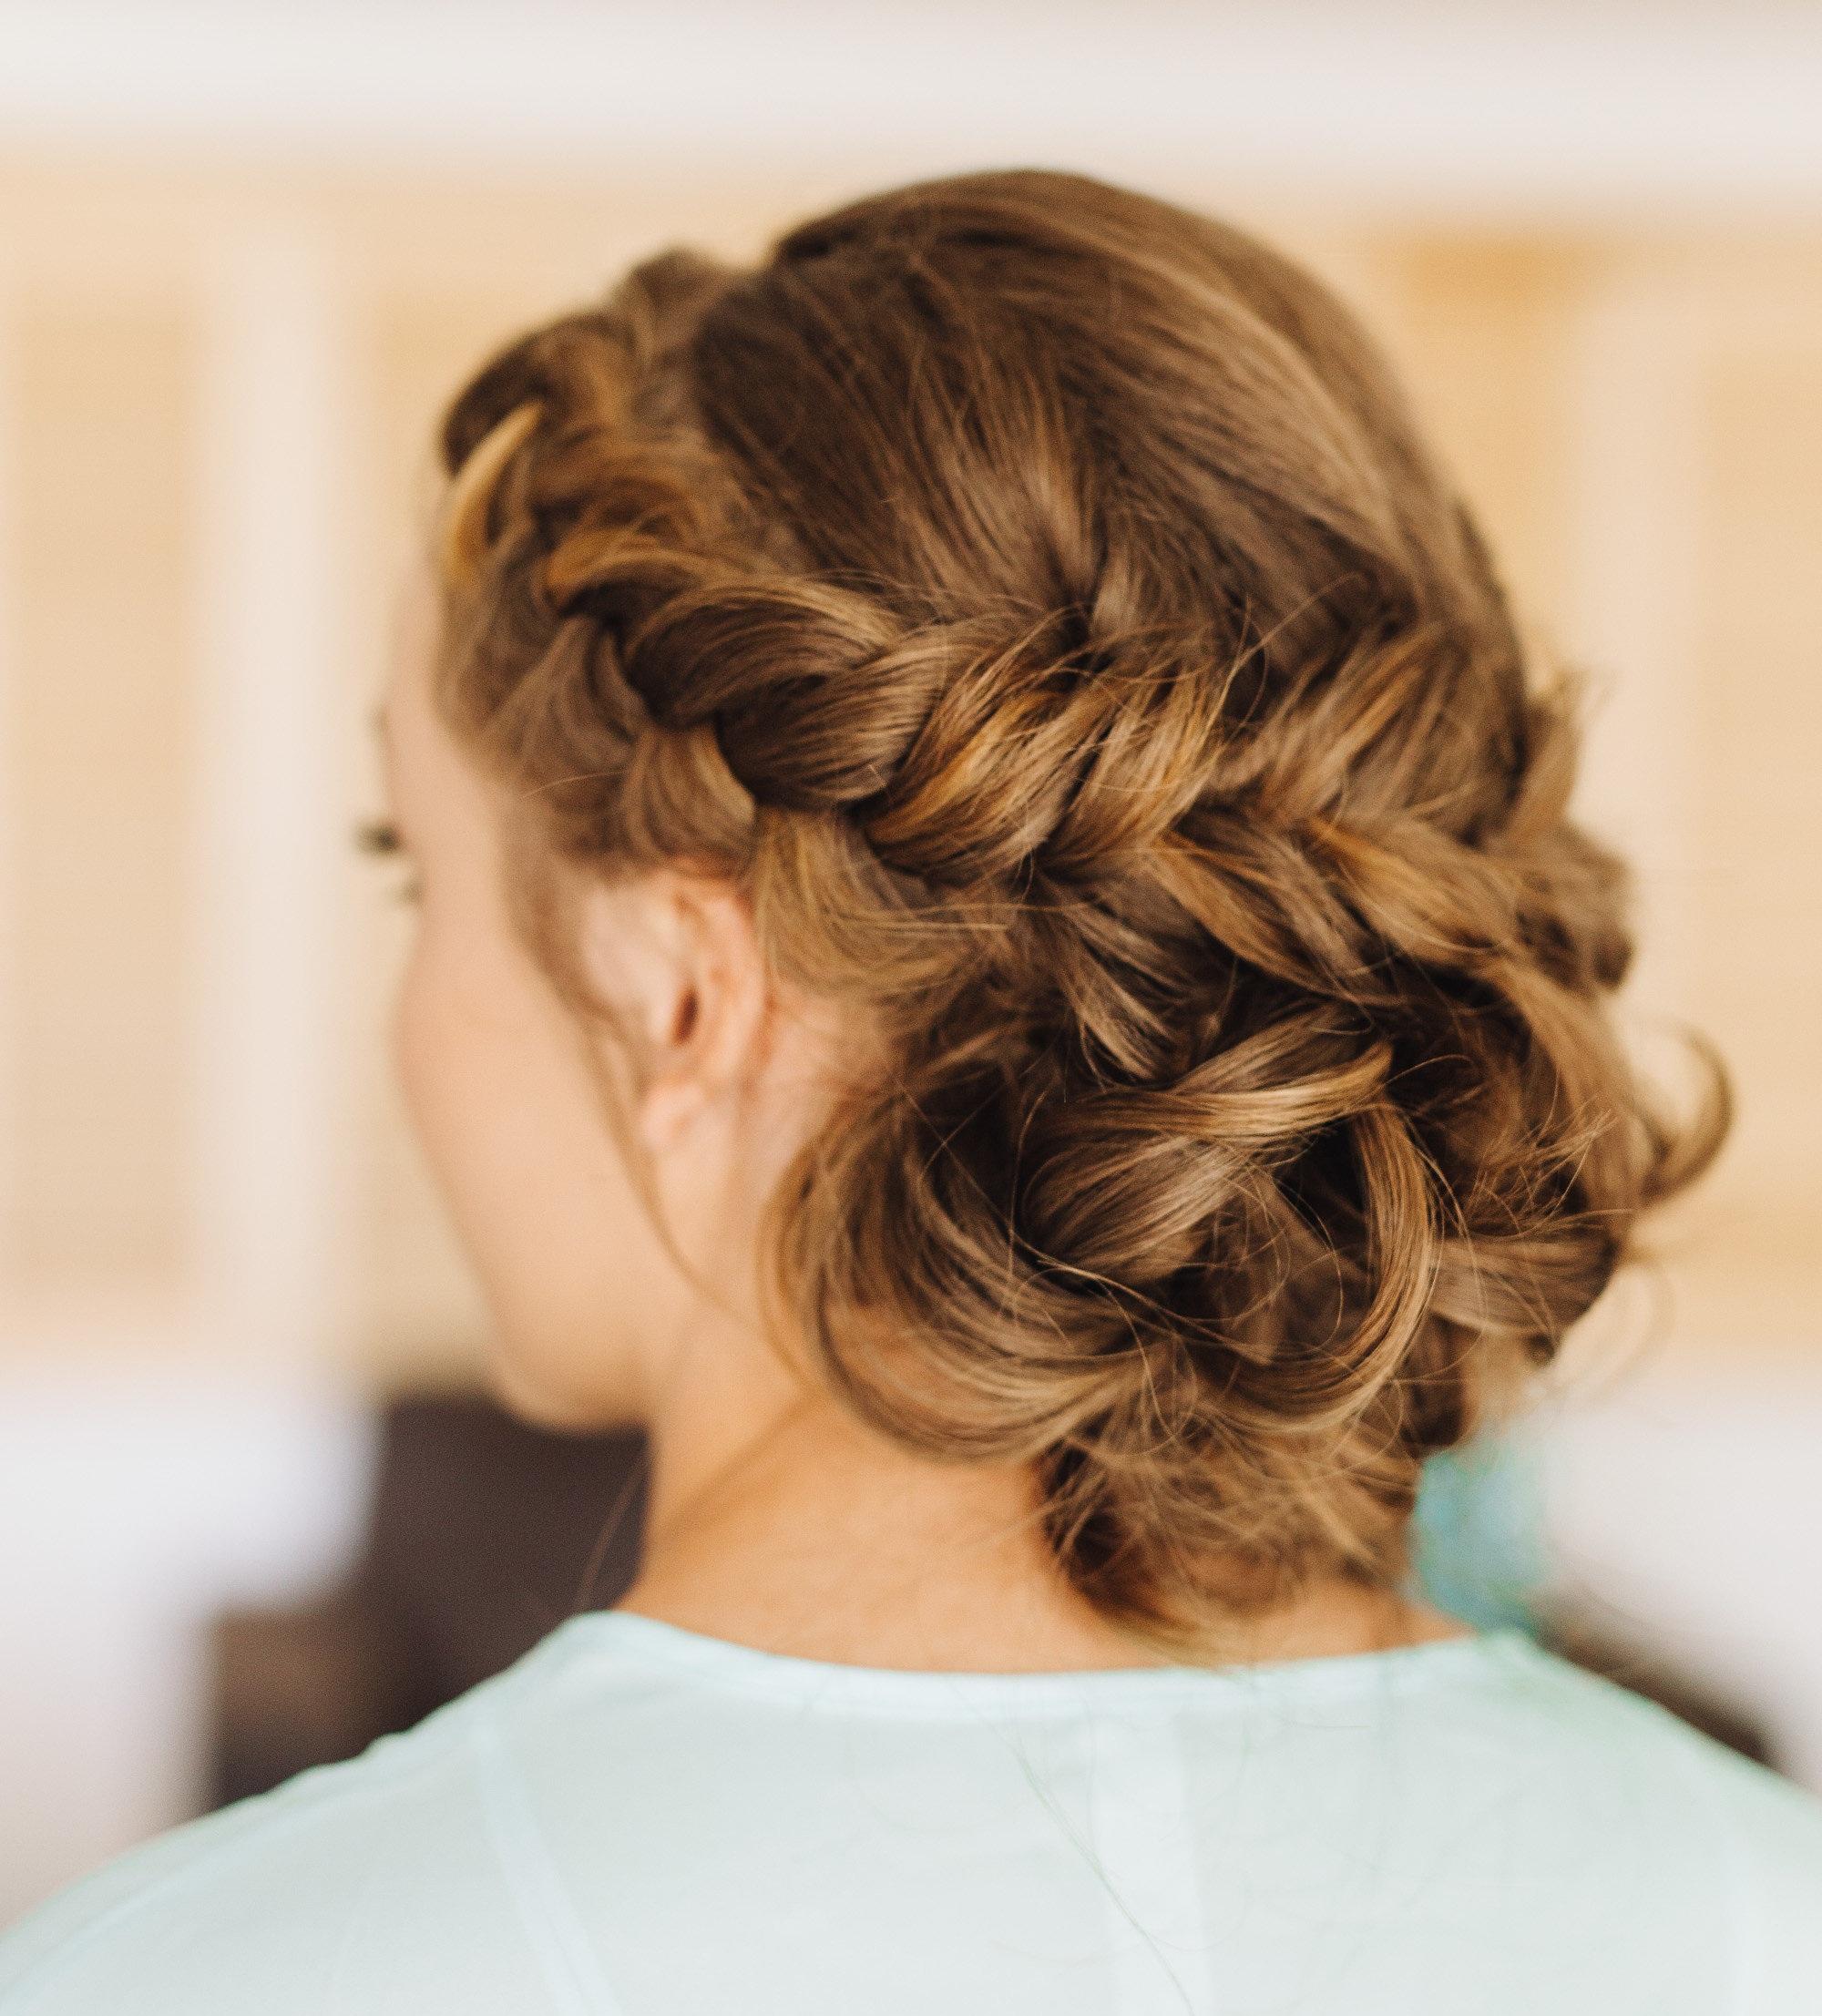 wedding-hair-and-makeup-2.jpg